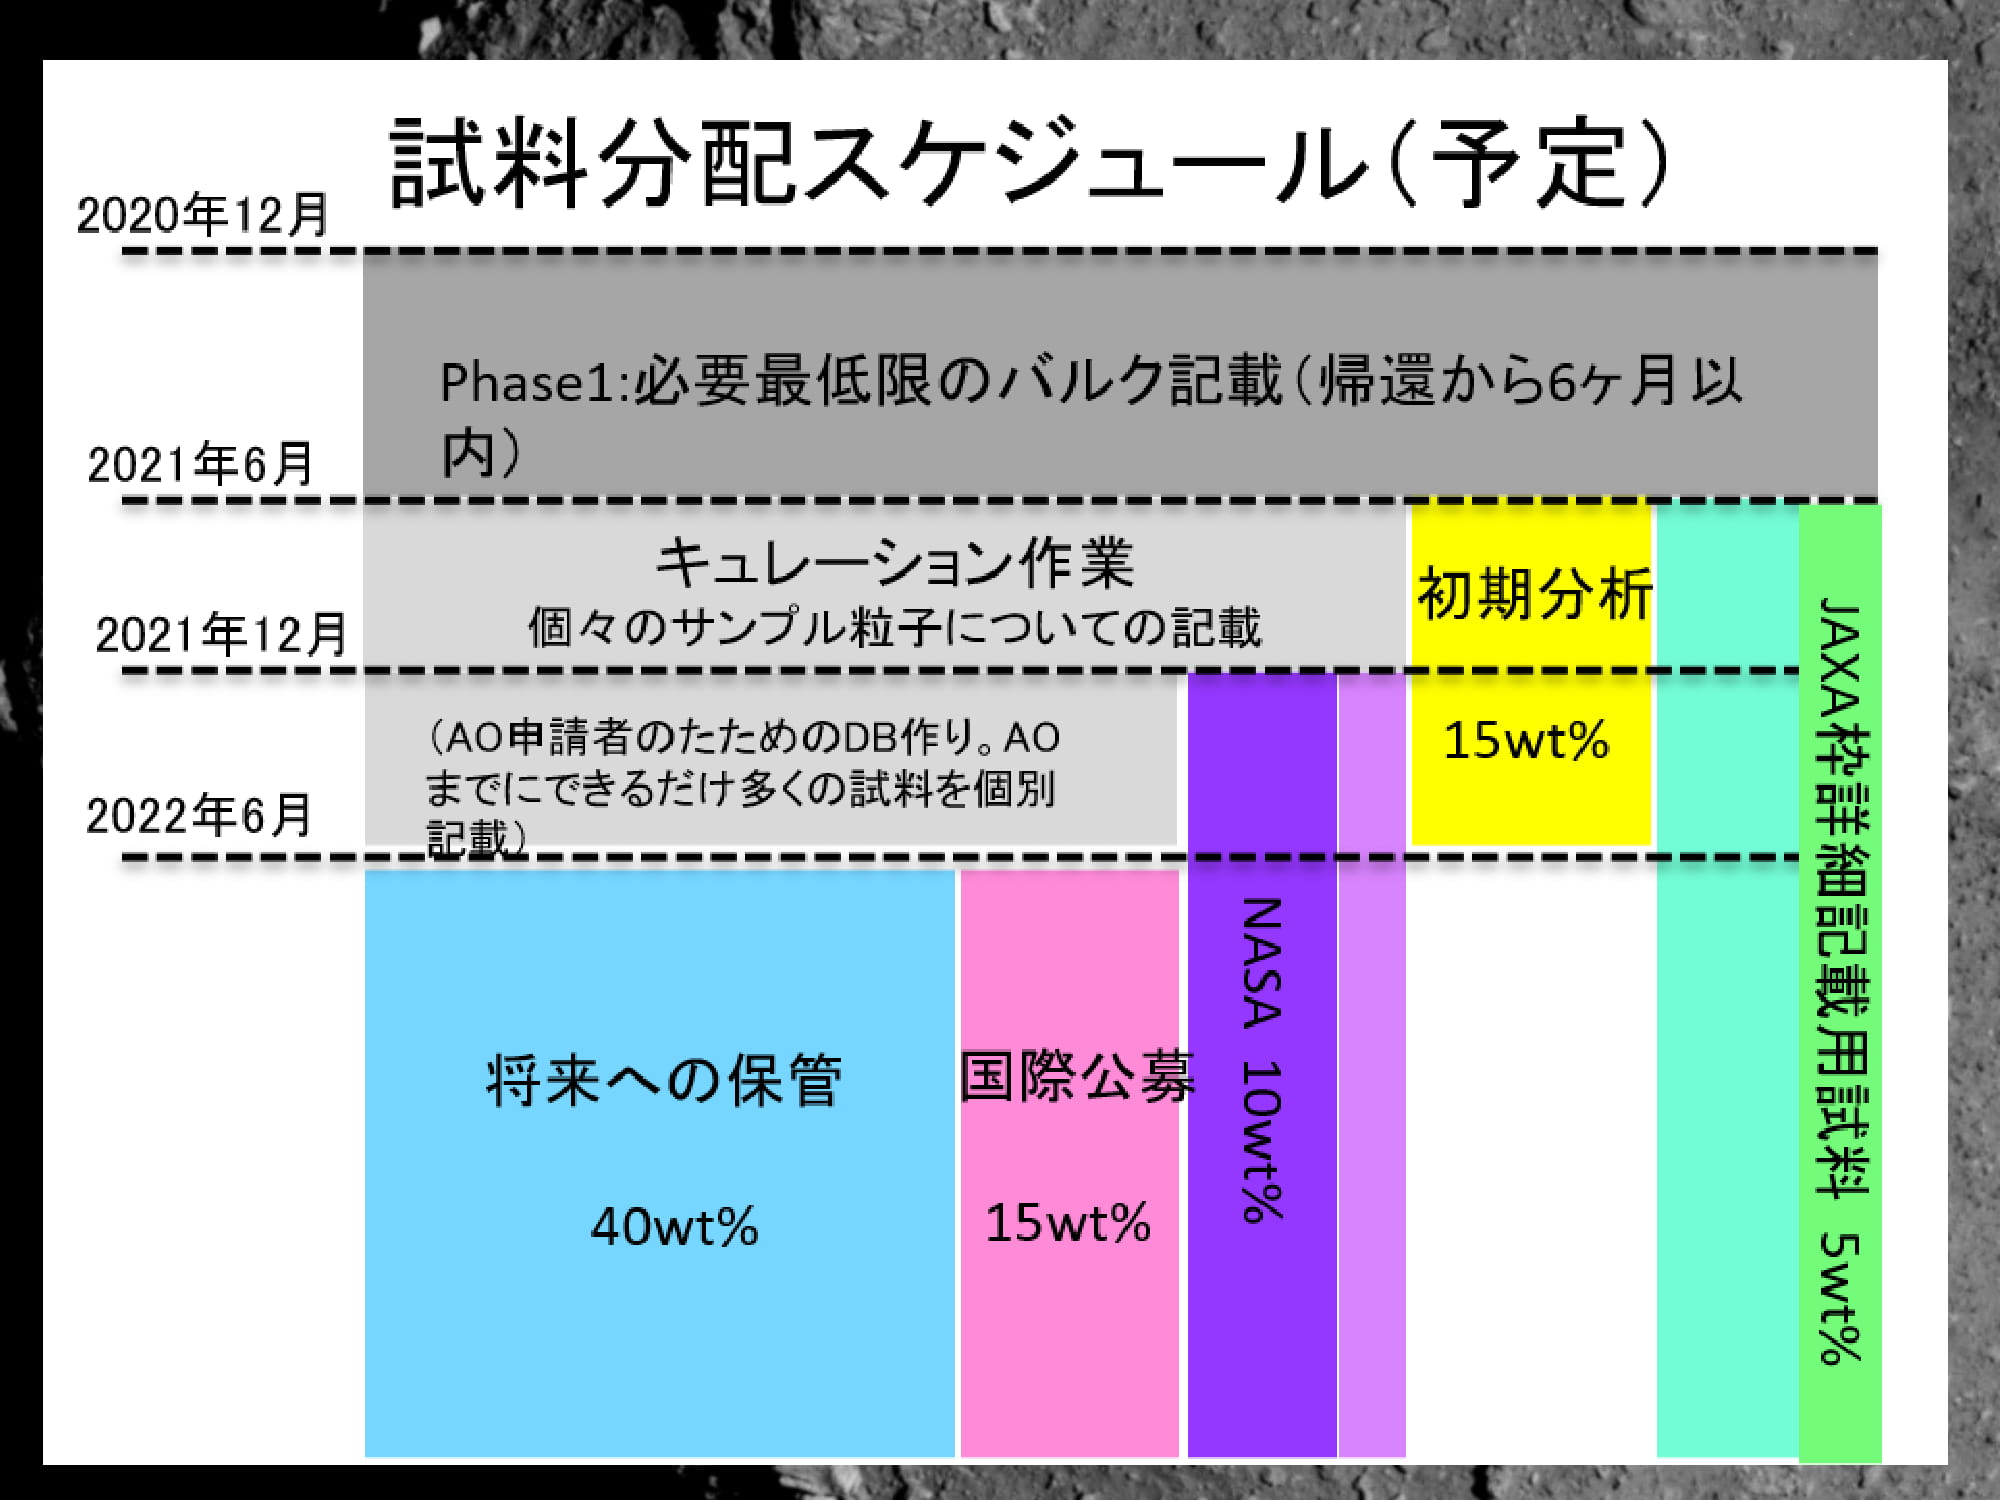 f:id:Imamura:20201208123049j:plain